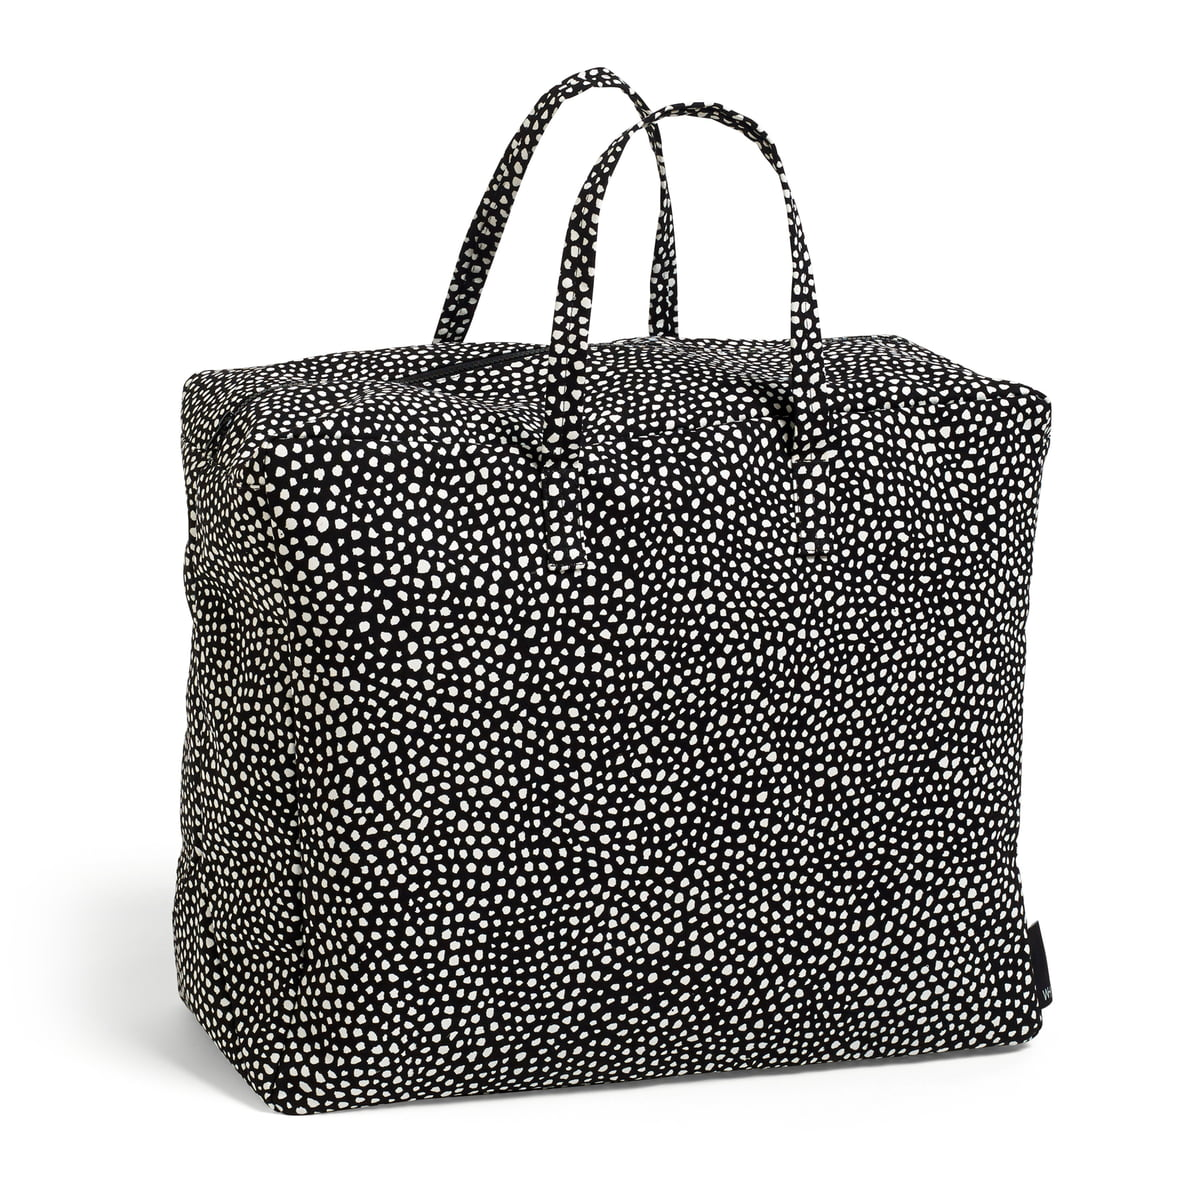 Hay Dot Beach Bag in the shop